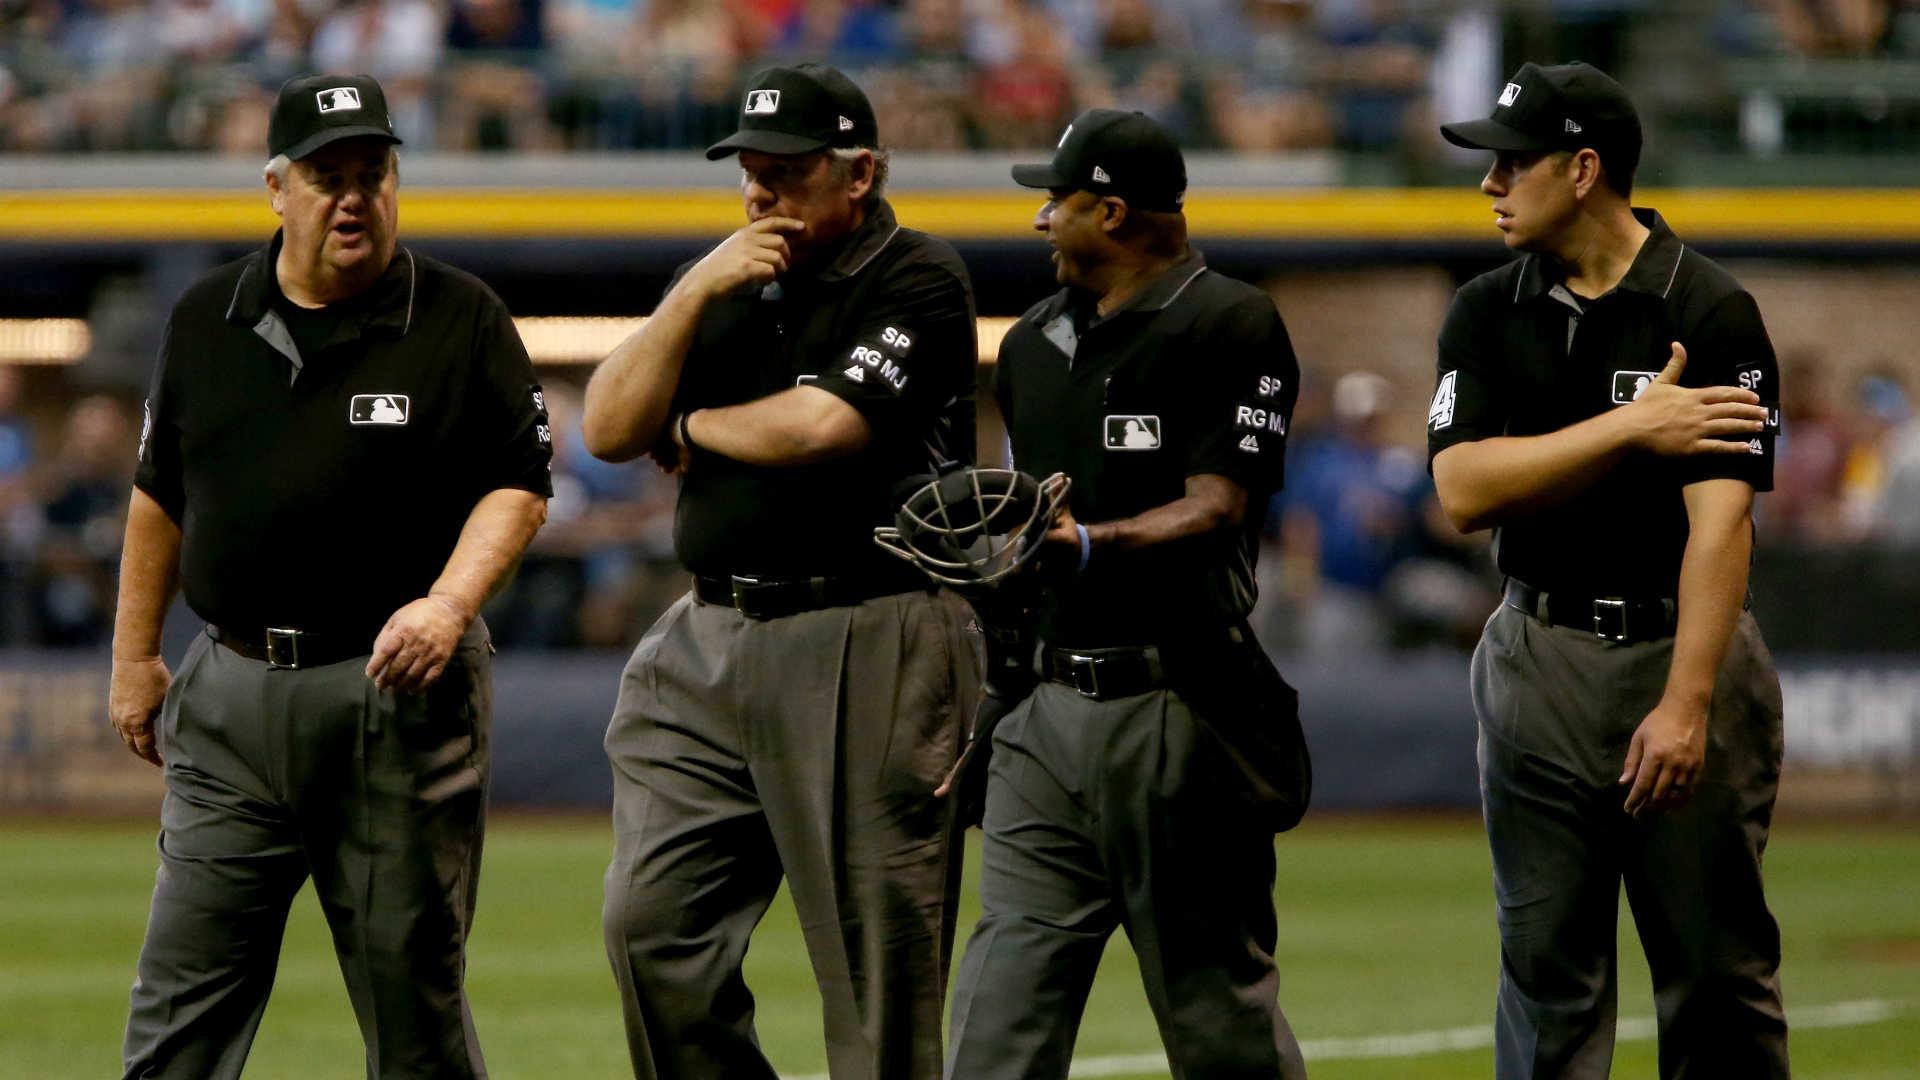 MLB umpires missed 34,294 ball-strike calls in 2018